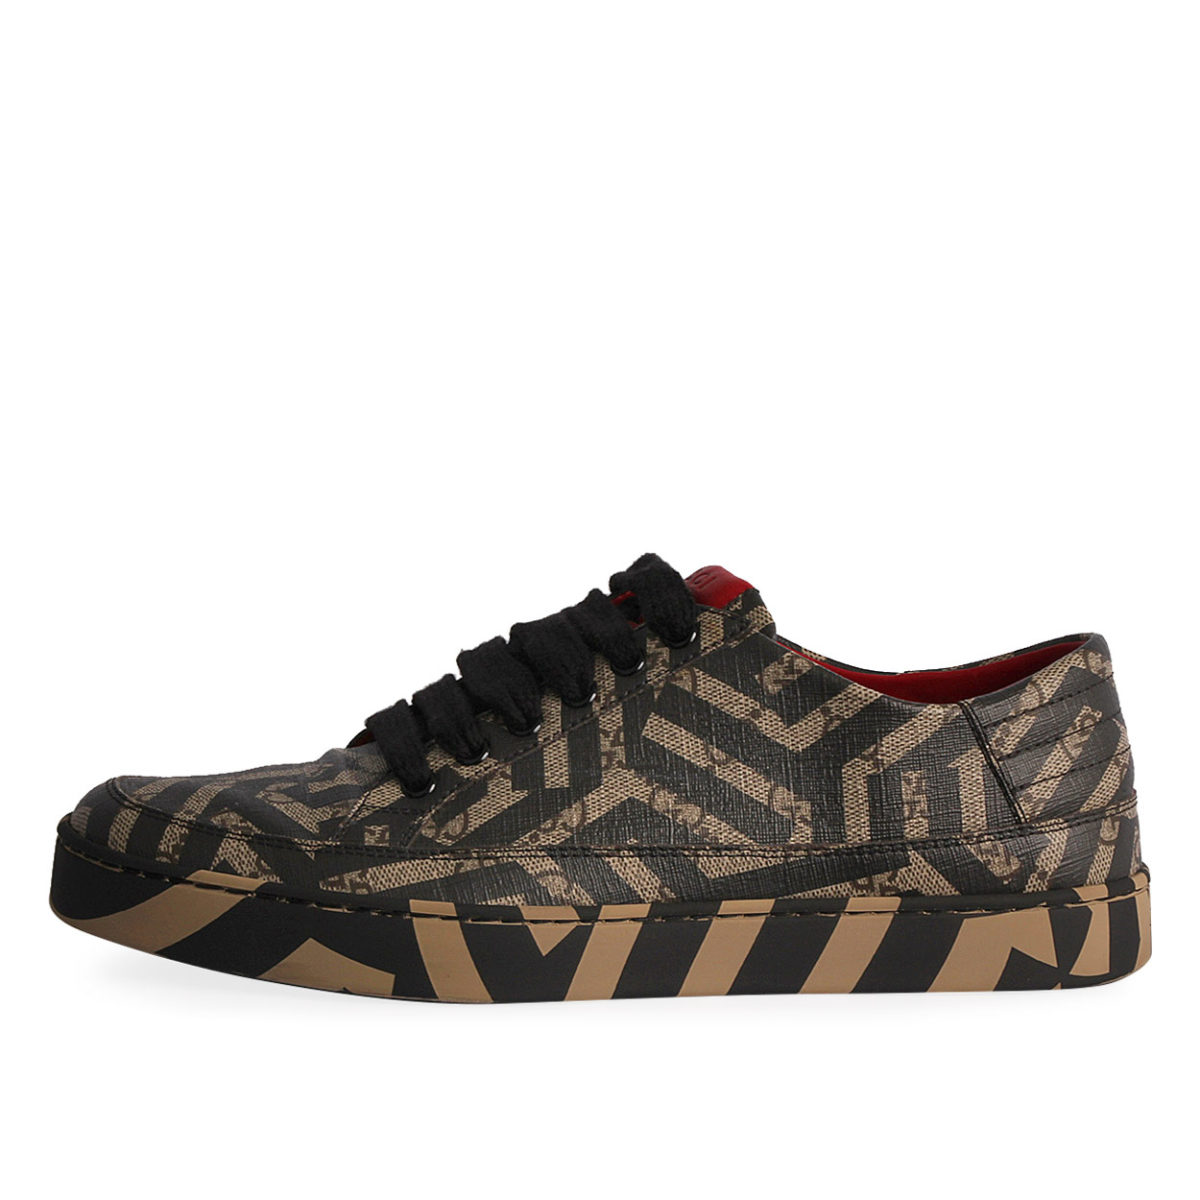 3d011bacb06 GUCCI GG Caleido Men s Sneakers Black Beige - S  41 (7.5)